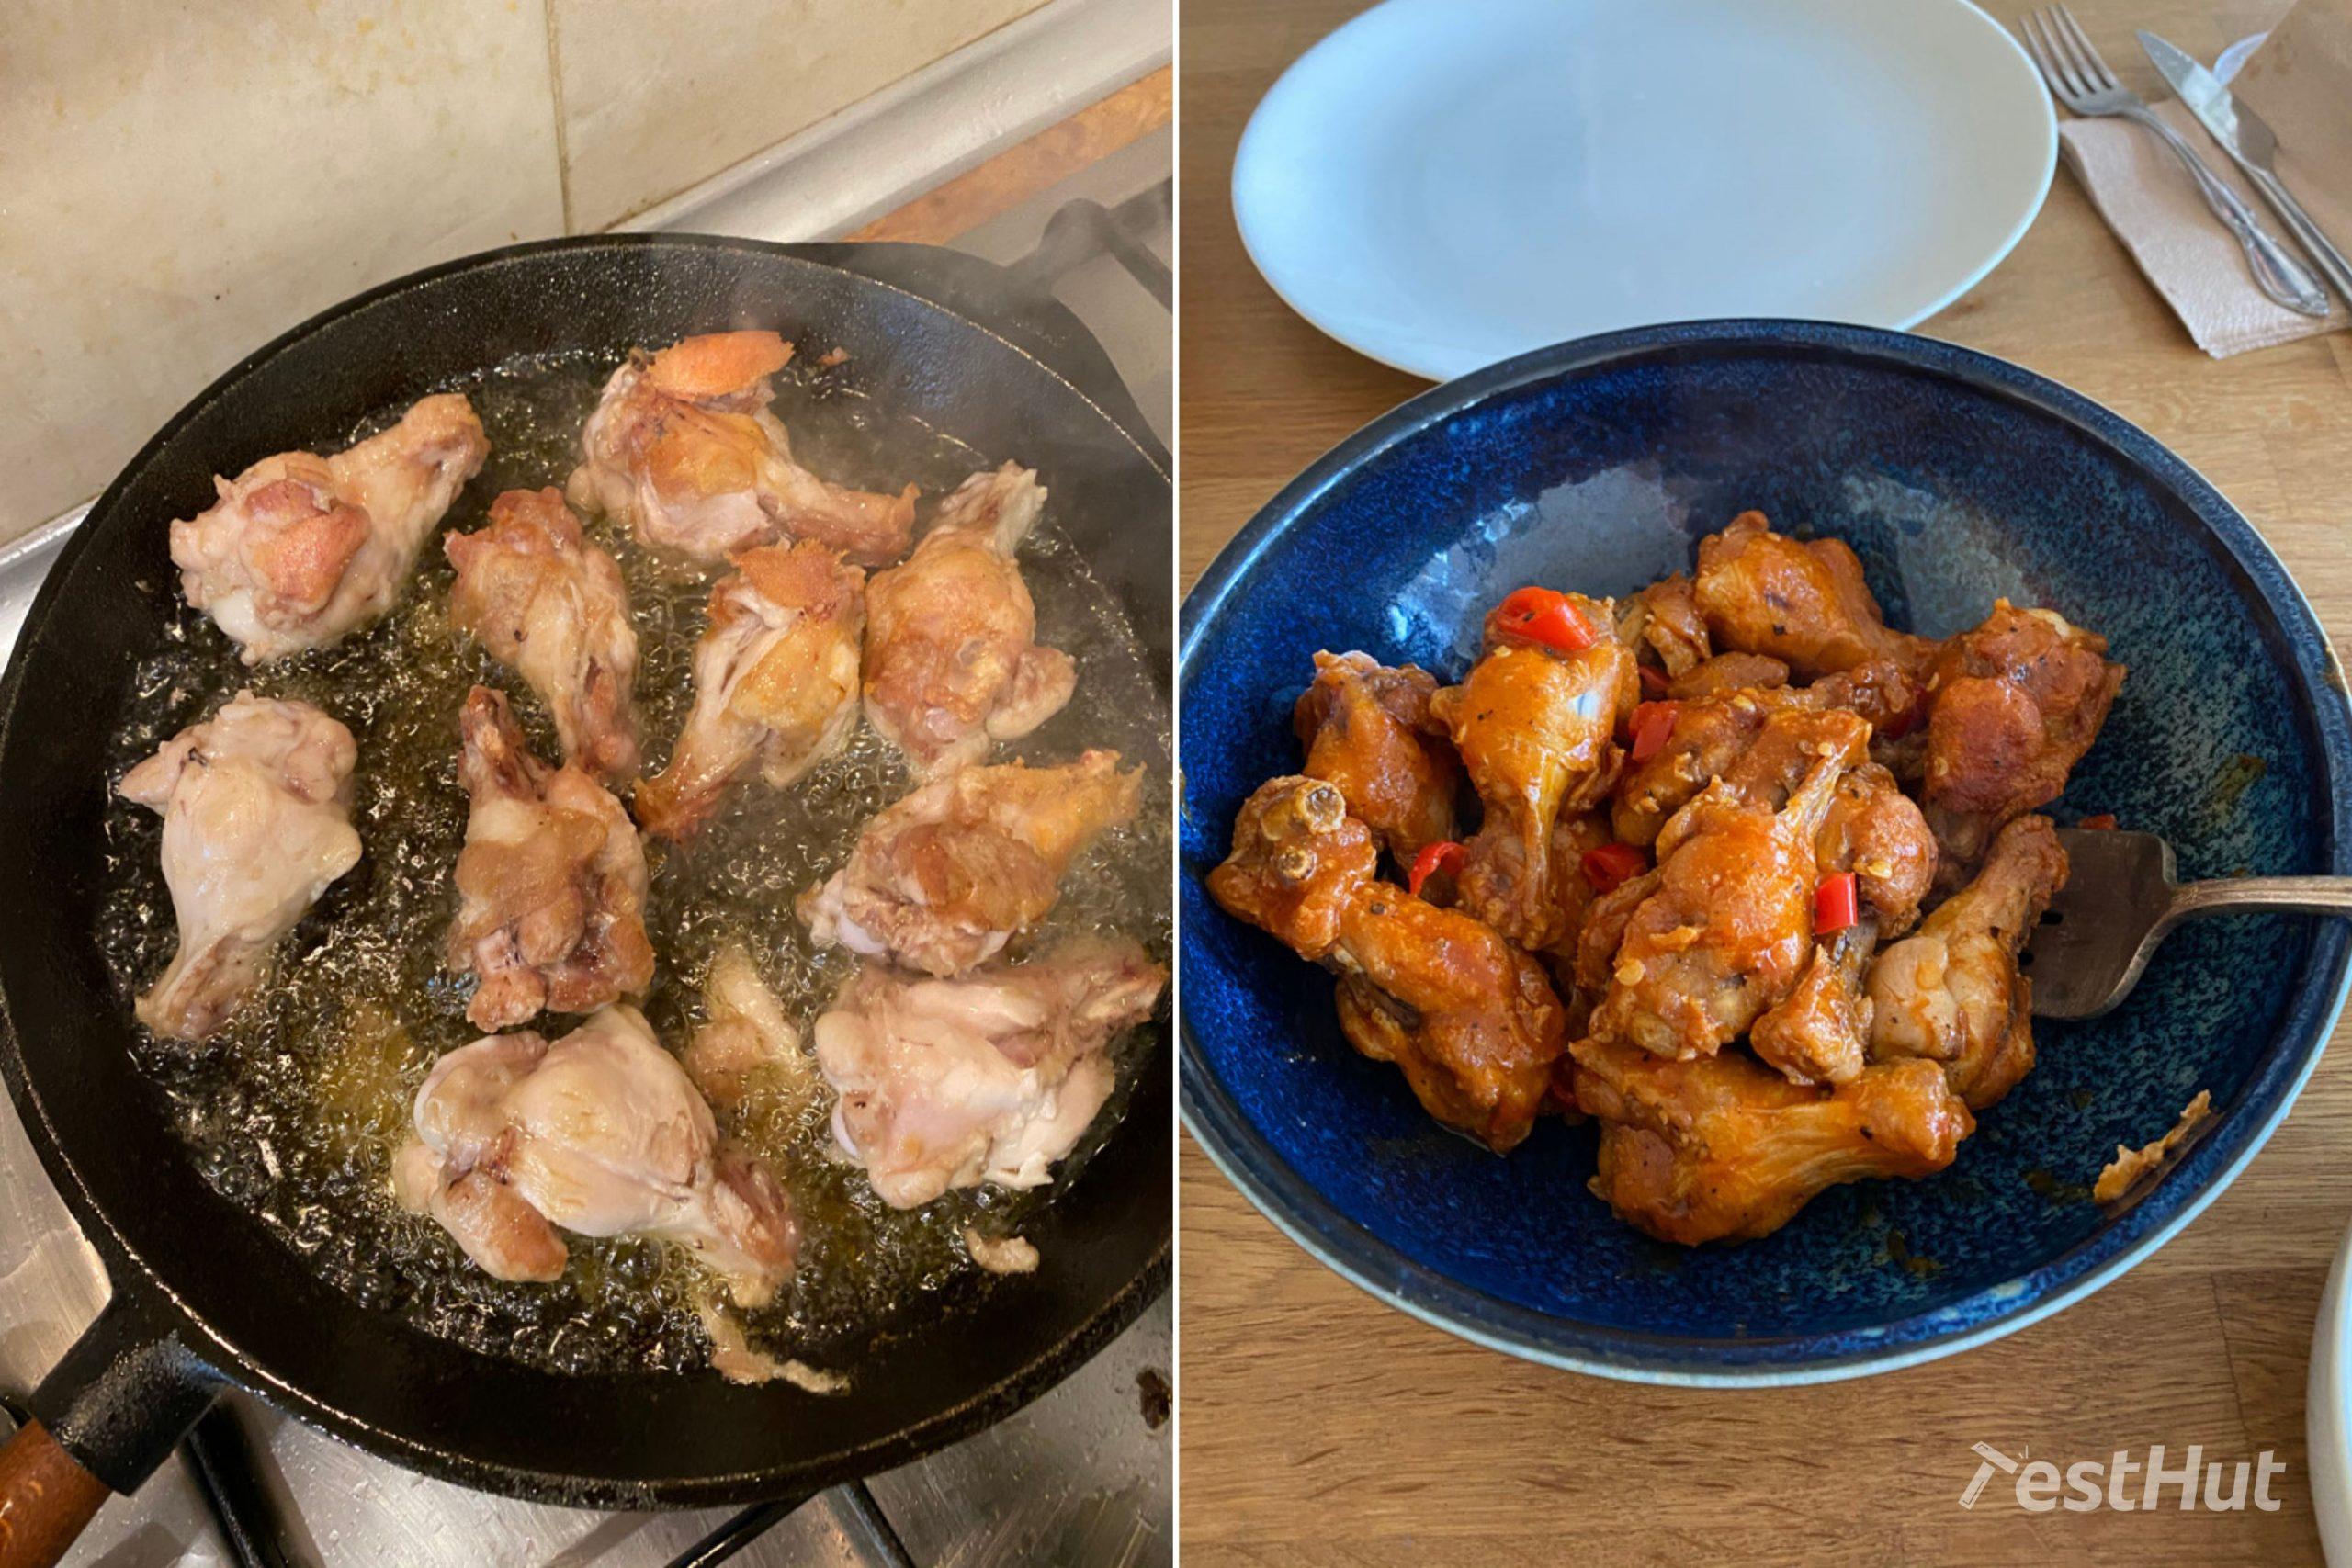 Skeppshult Professional Walnut Frying Pan cooking